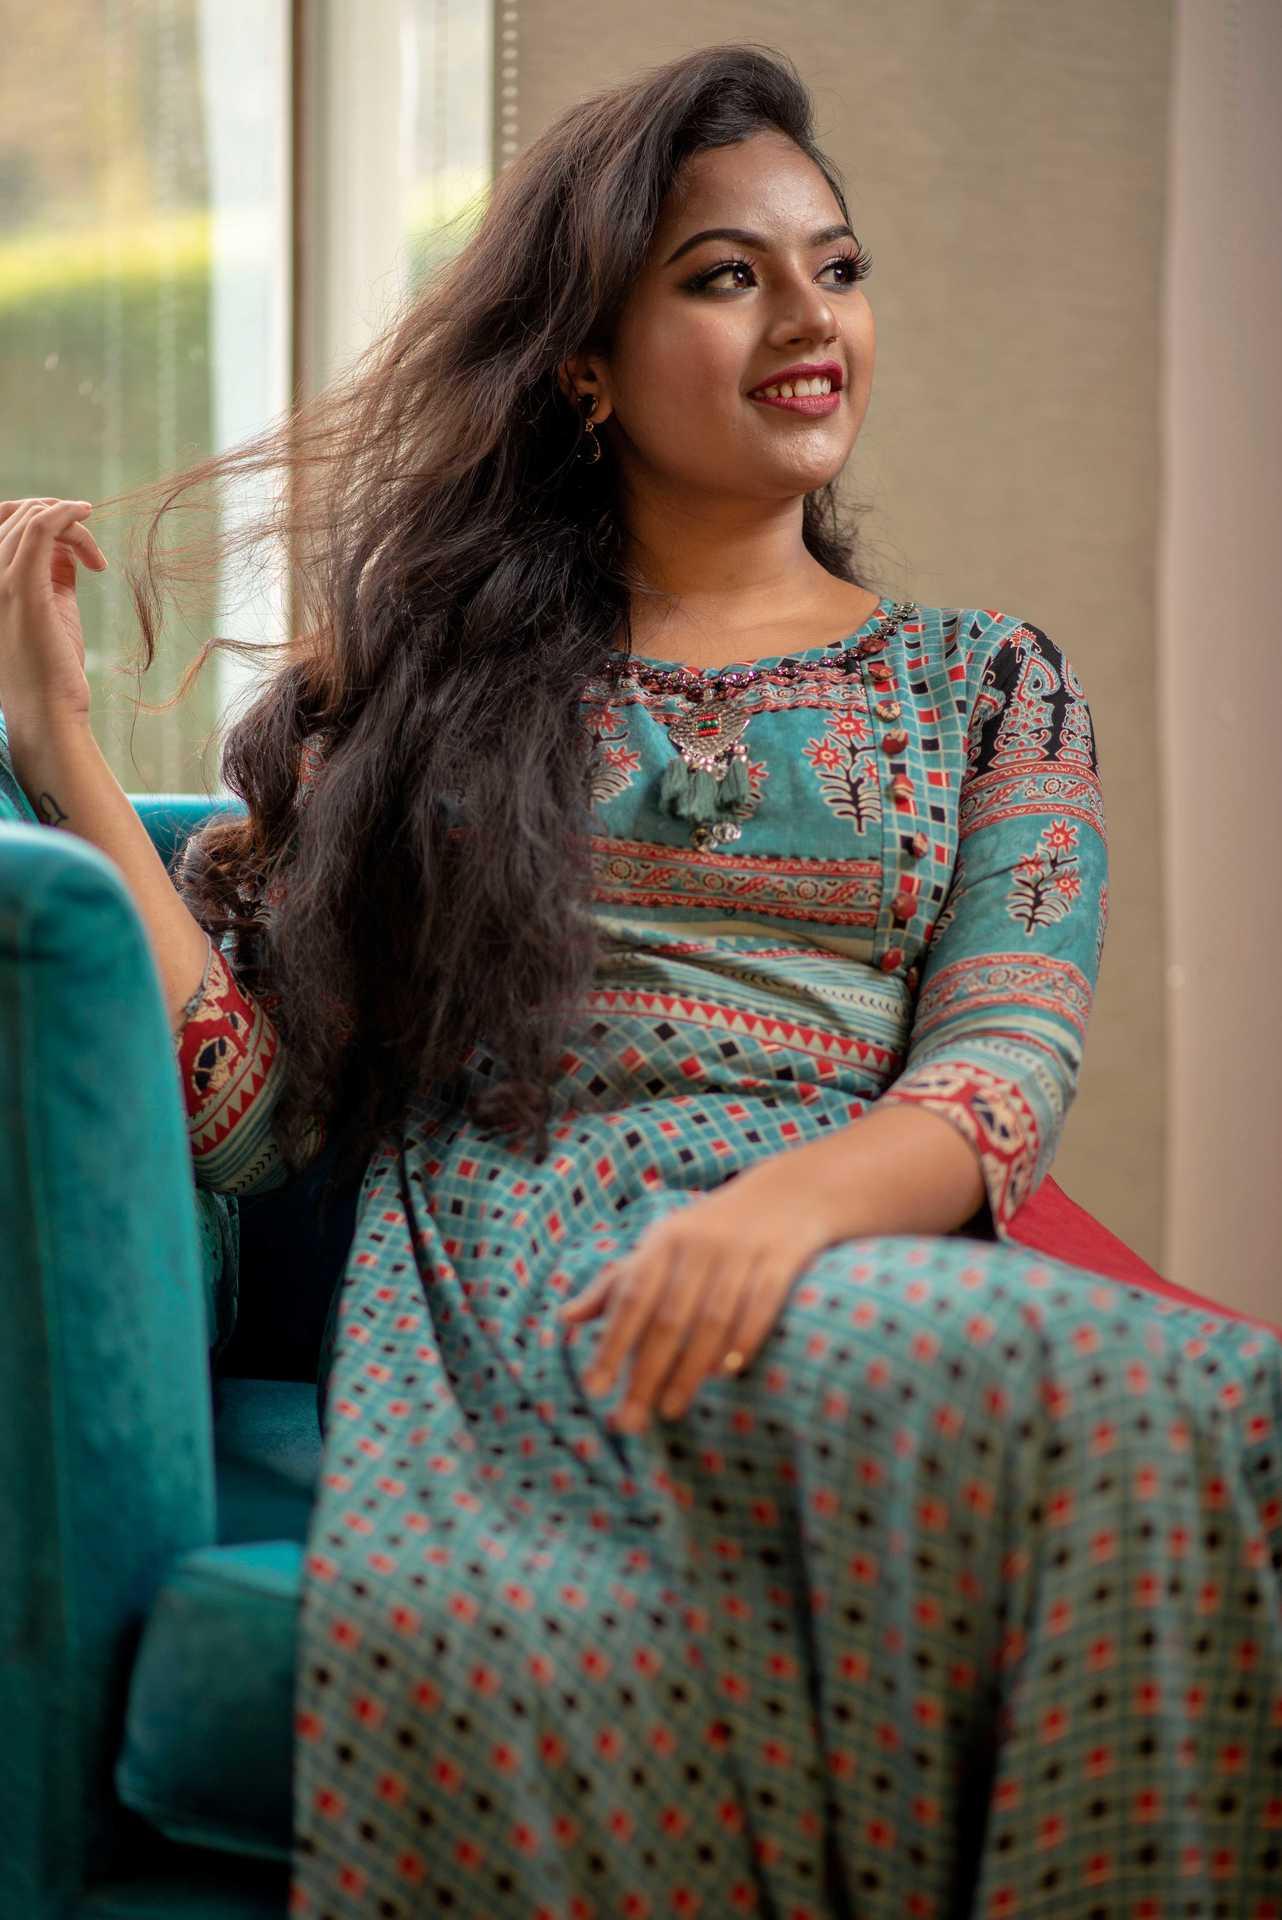 The Fashion Curve by Madhurima - _DSC9249